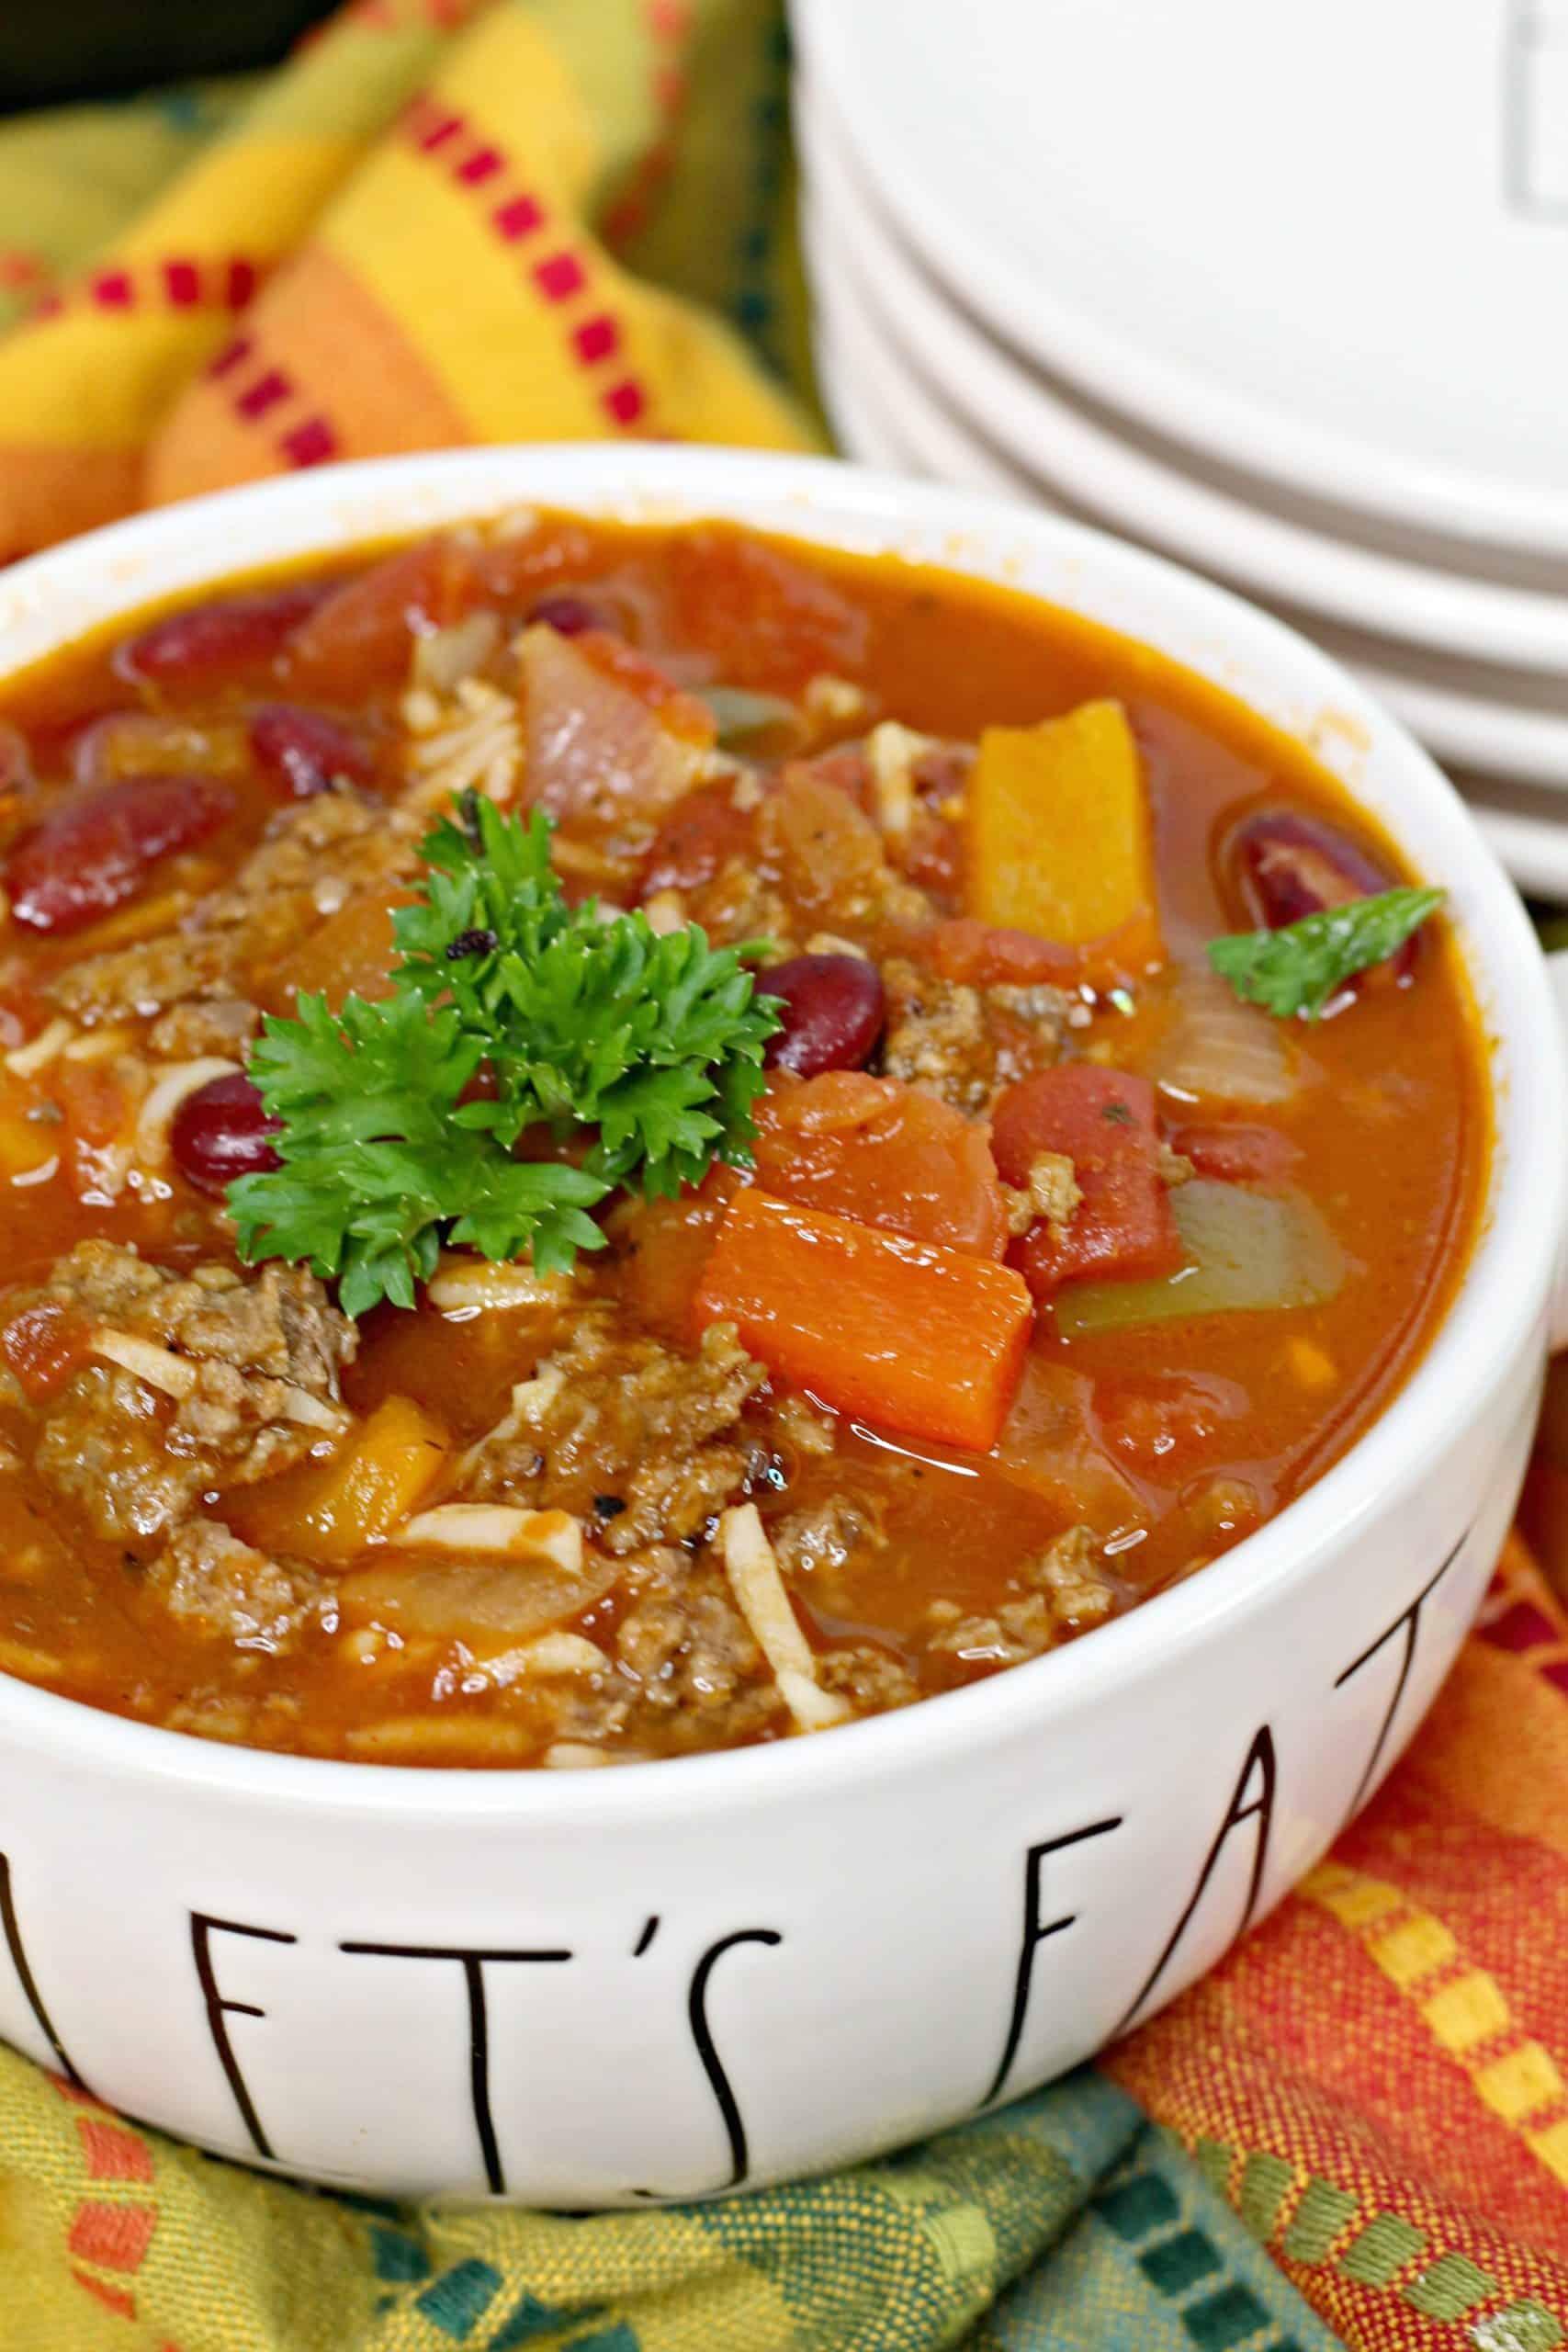 Bowl of Instant Pot Stuffed Pepper Soup